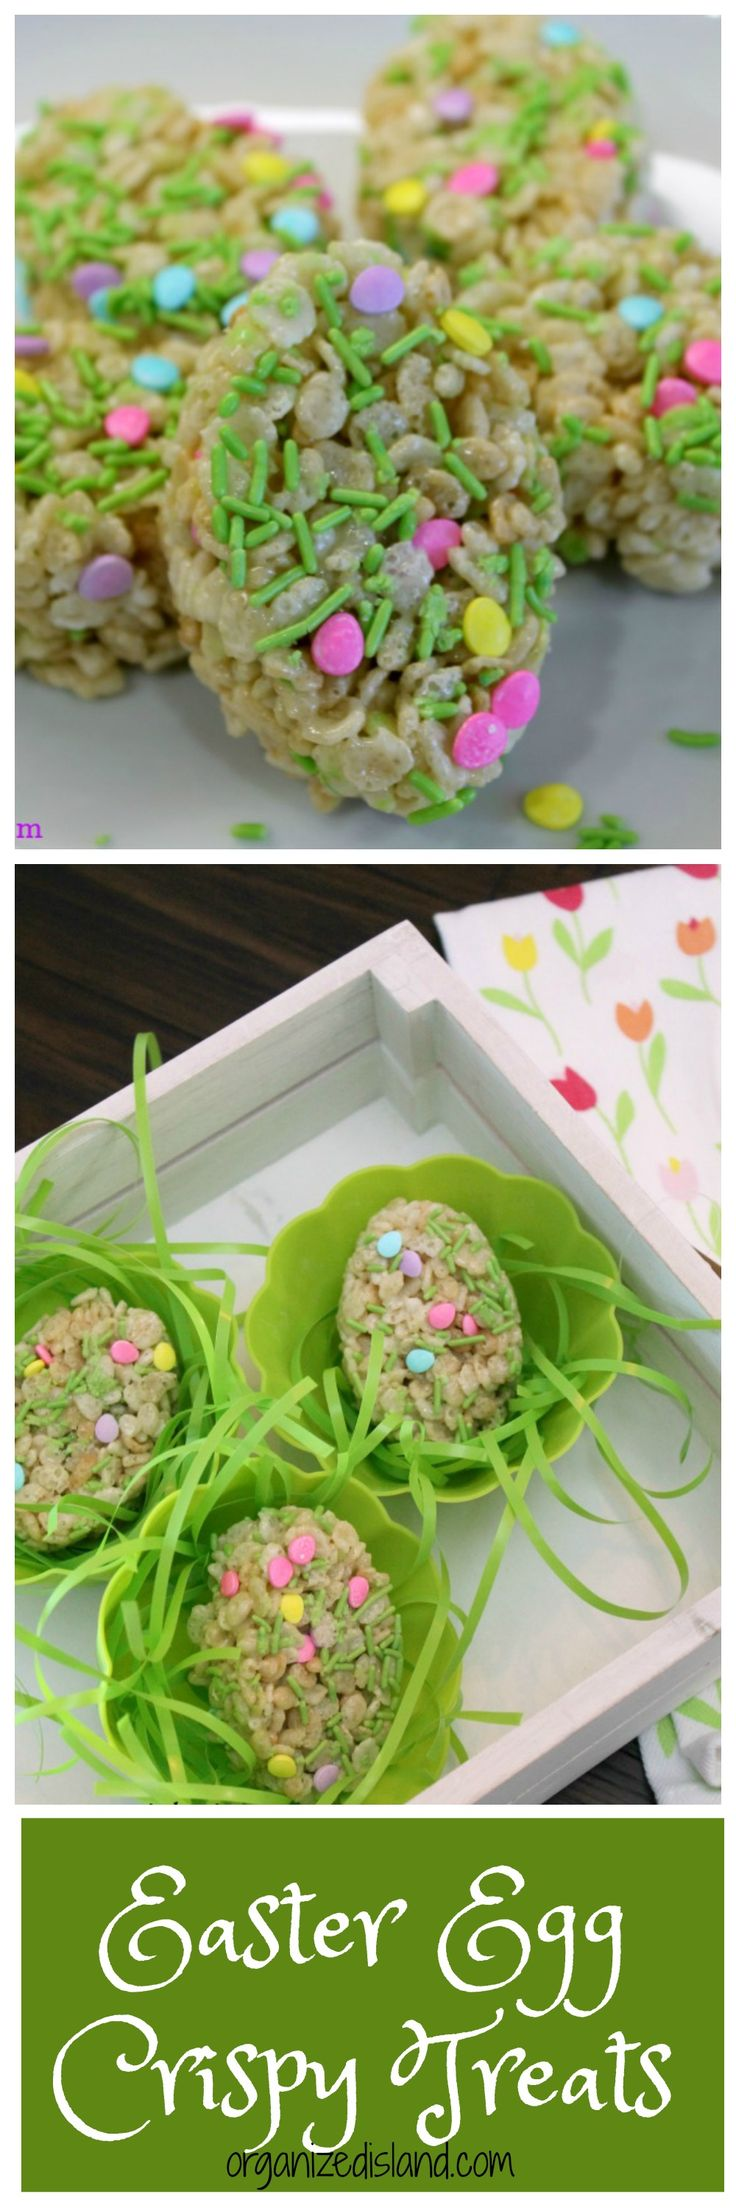 Fun Easter rice krispie treats idea for Easter snack or dessert.    #easter #dessert #snack #recipe #recipes #ricecrispytreats #ricecrispies